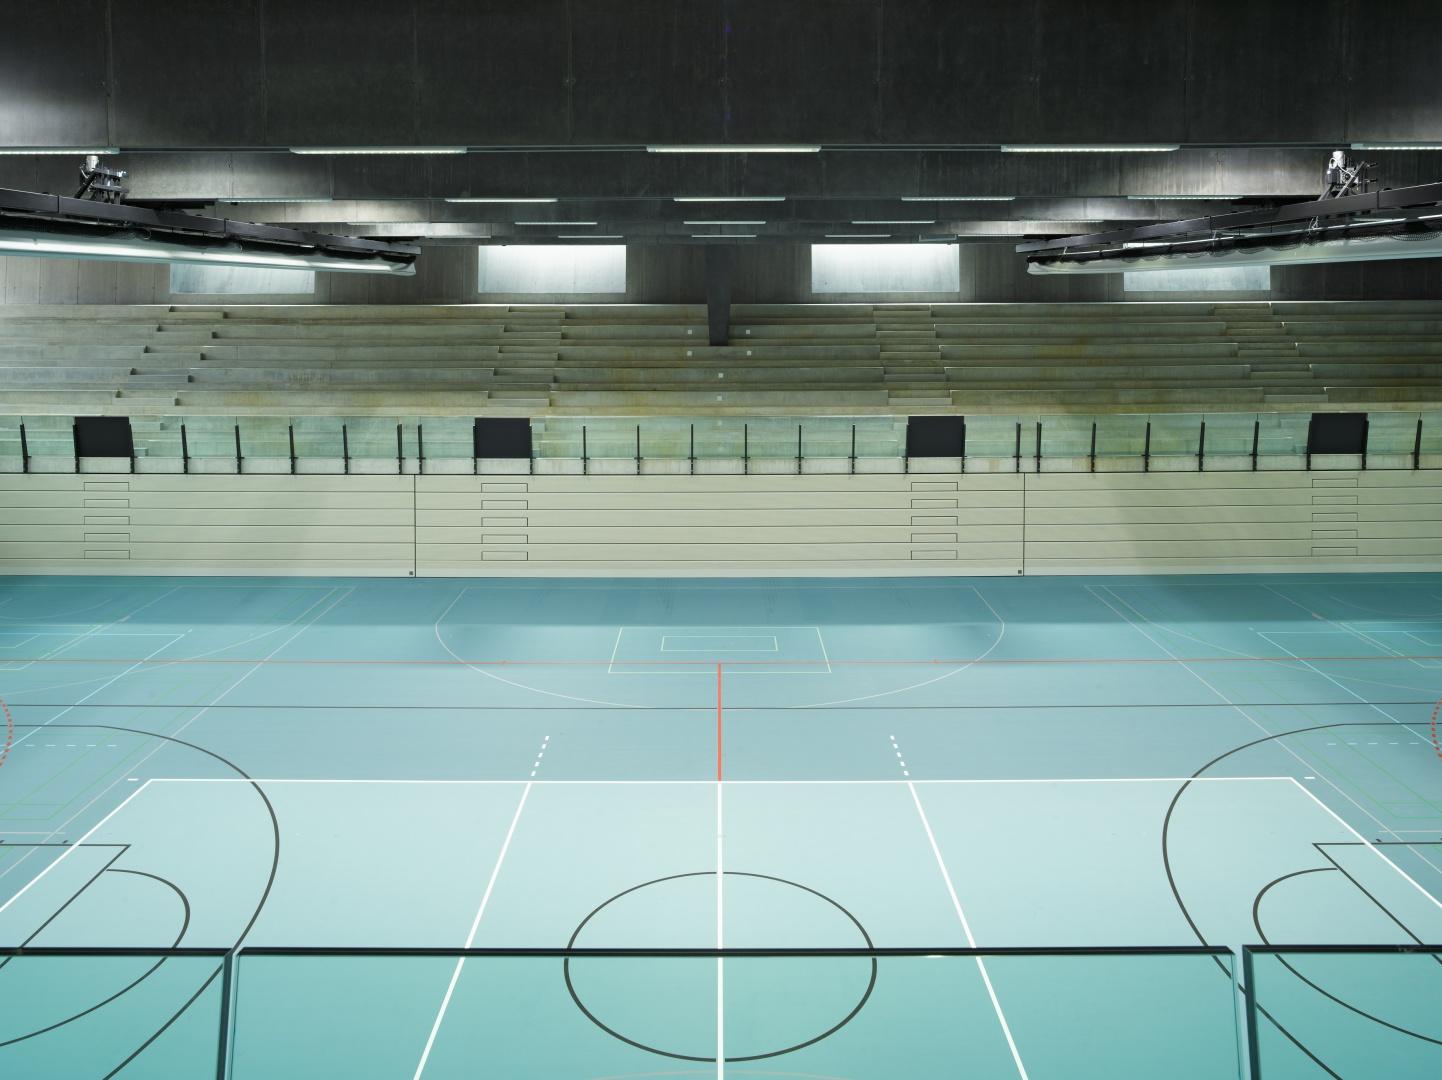 Wettkampfhalle © Dominique Uldry, Bern